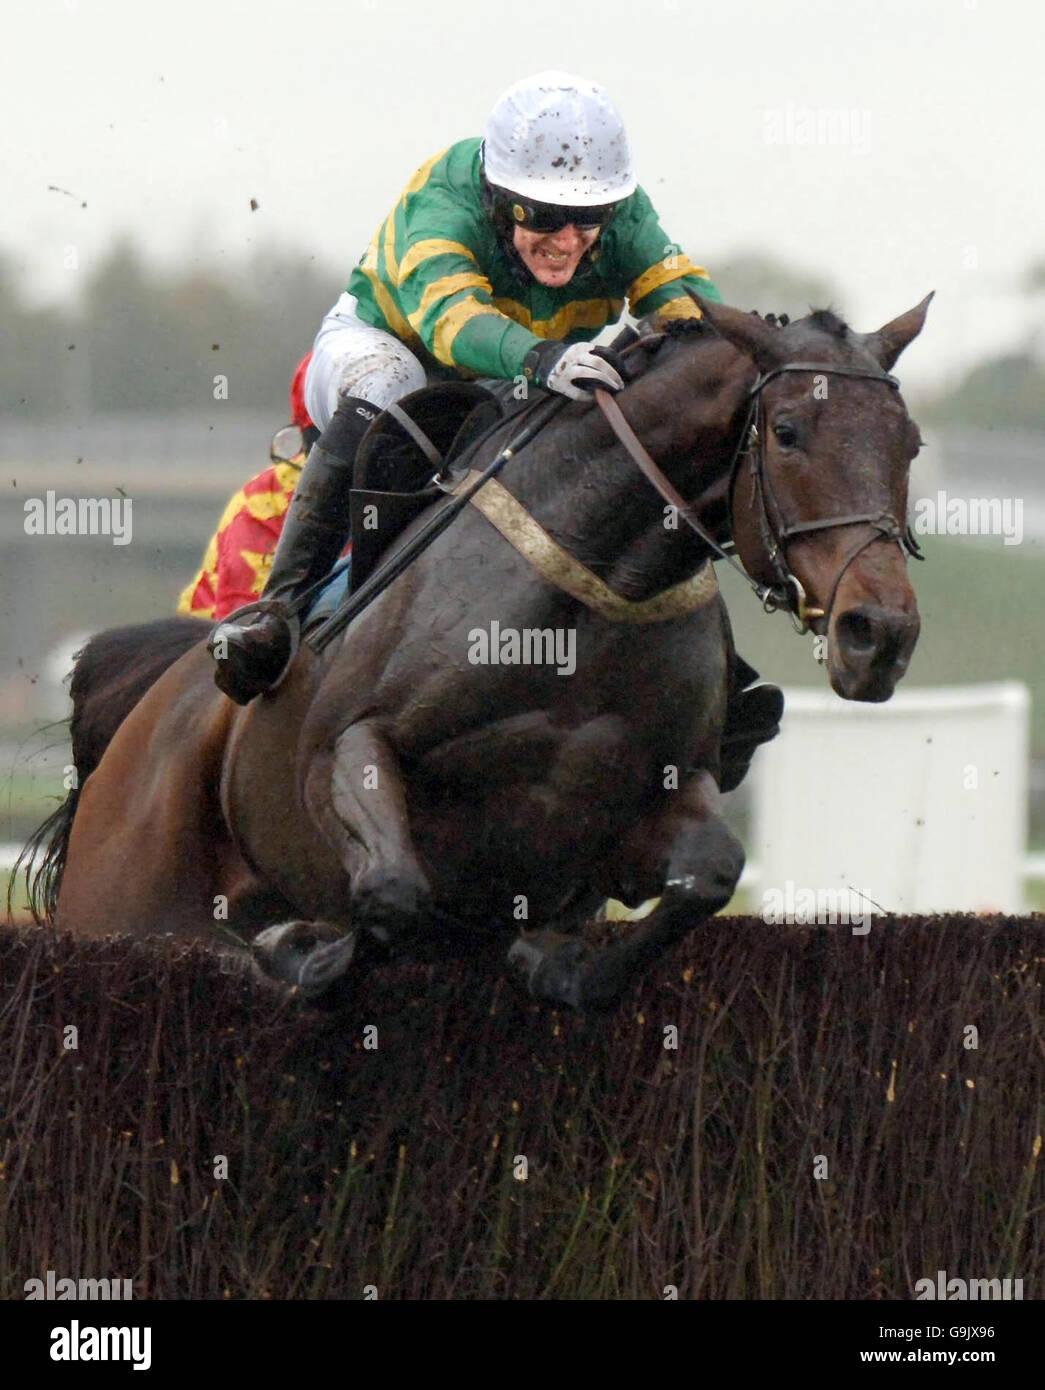 Racing - Weatherby - Stock Image